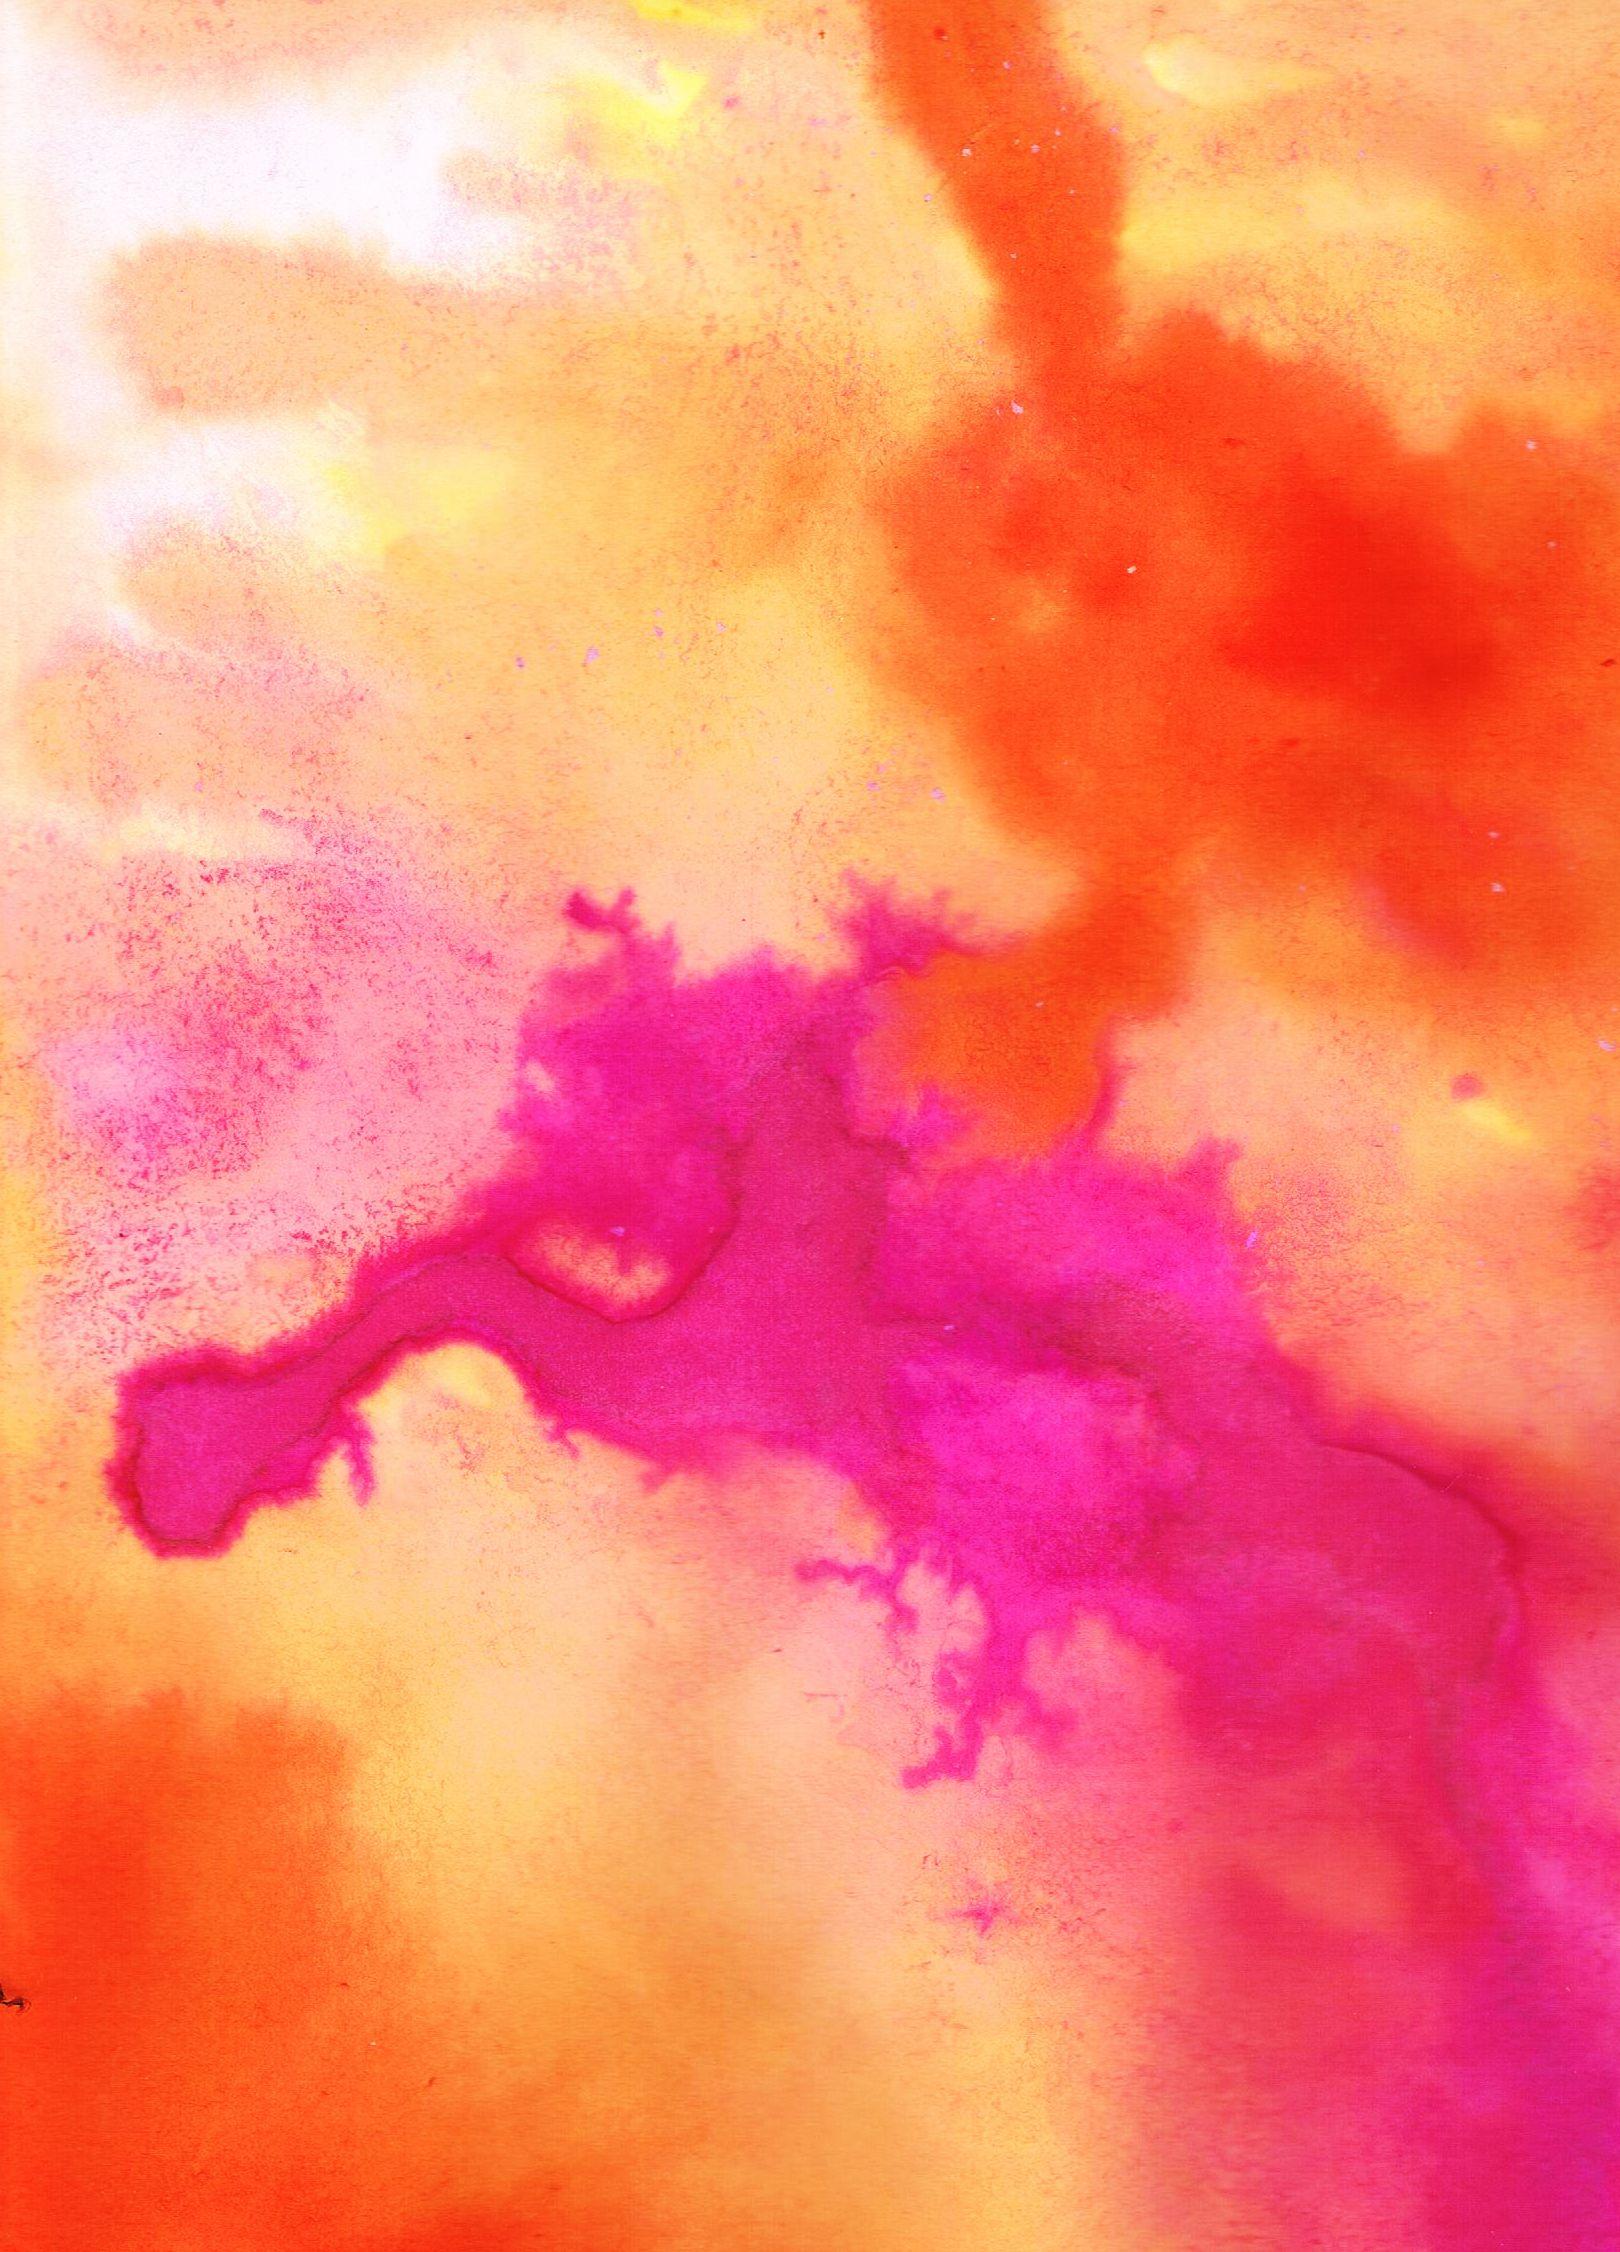 Bright Vibrant Colors With Images Orange Wallpaper Orange Art